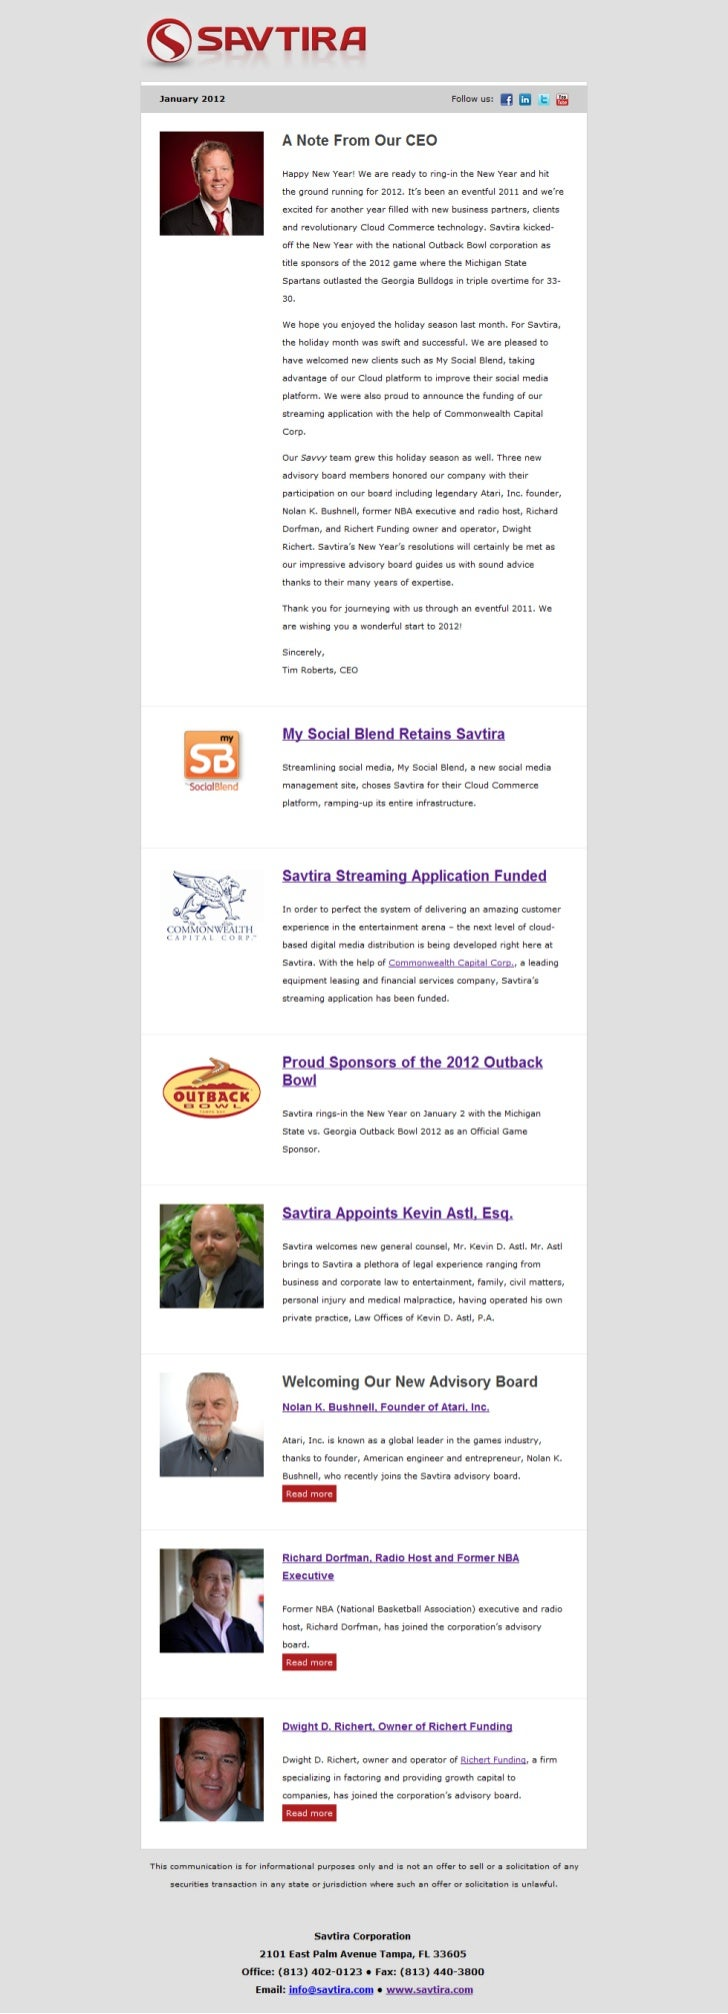 Savtira Newsletter - January 2012